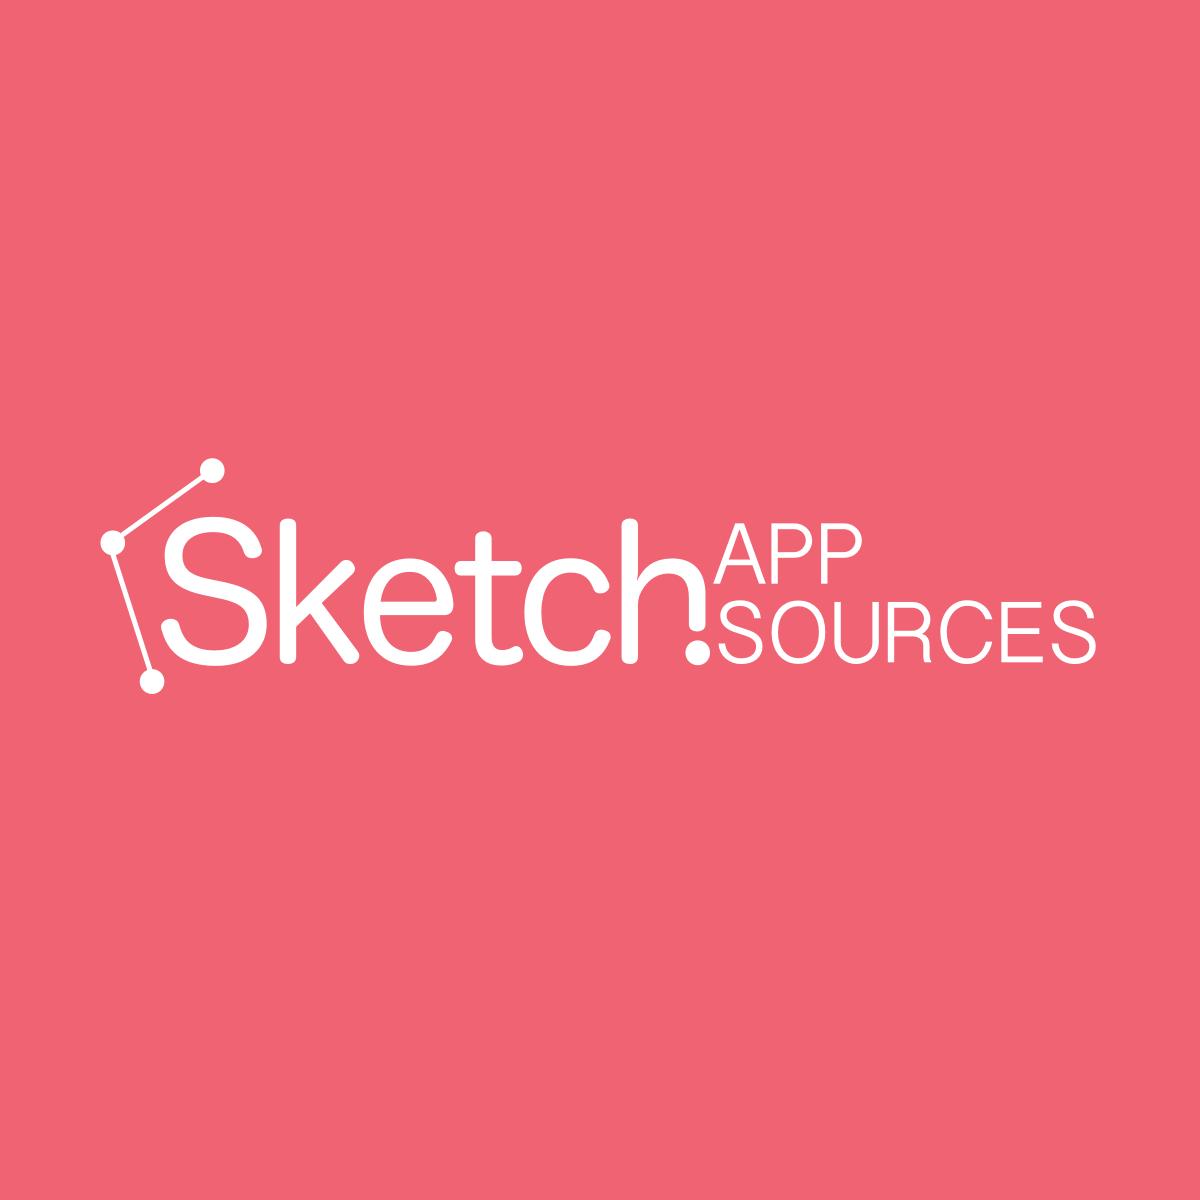 How to Solve Missing Fonts in Sketch App - Sketch App